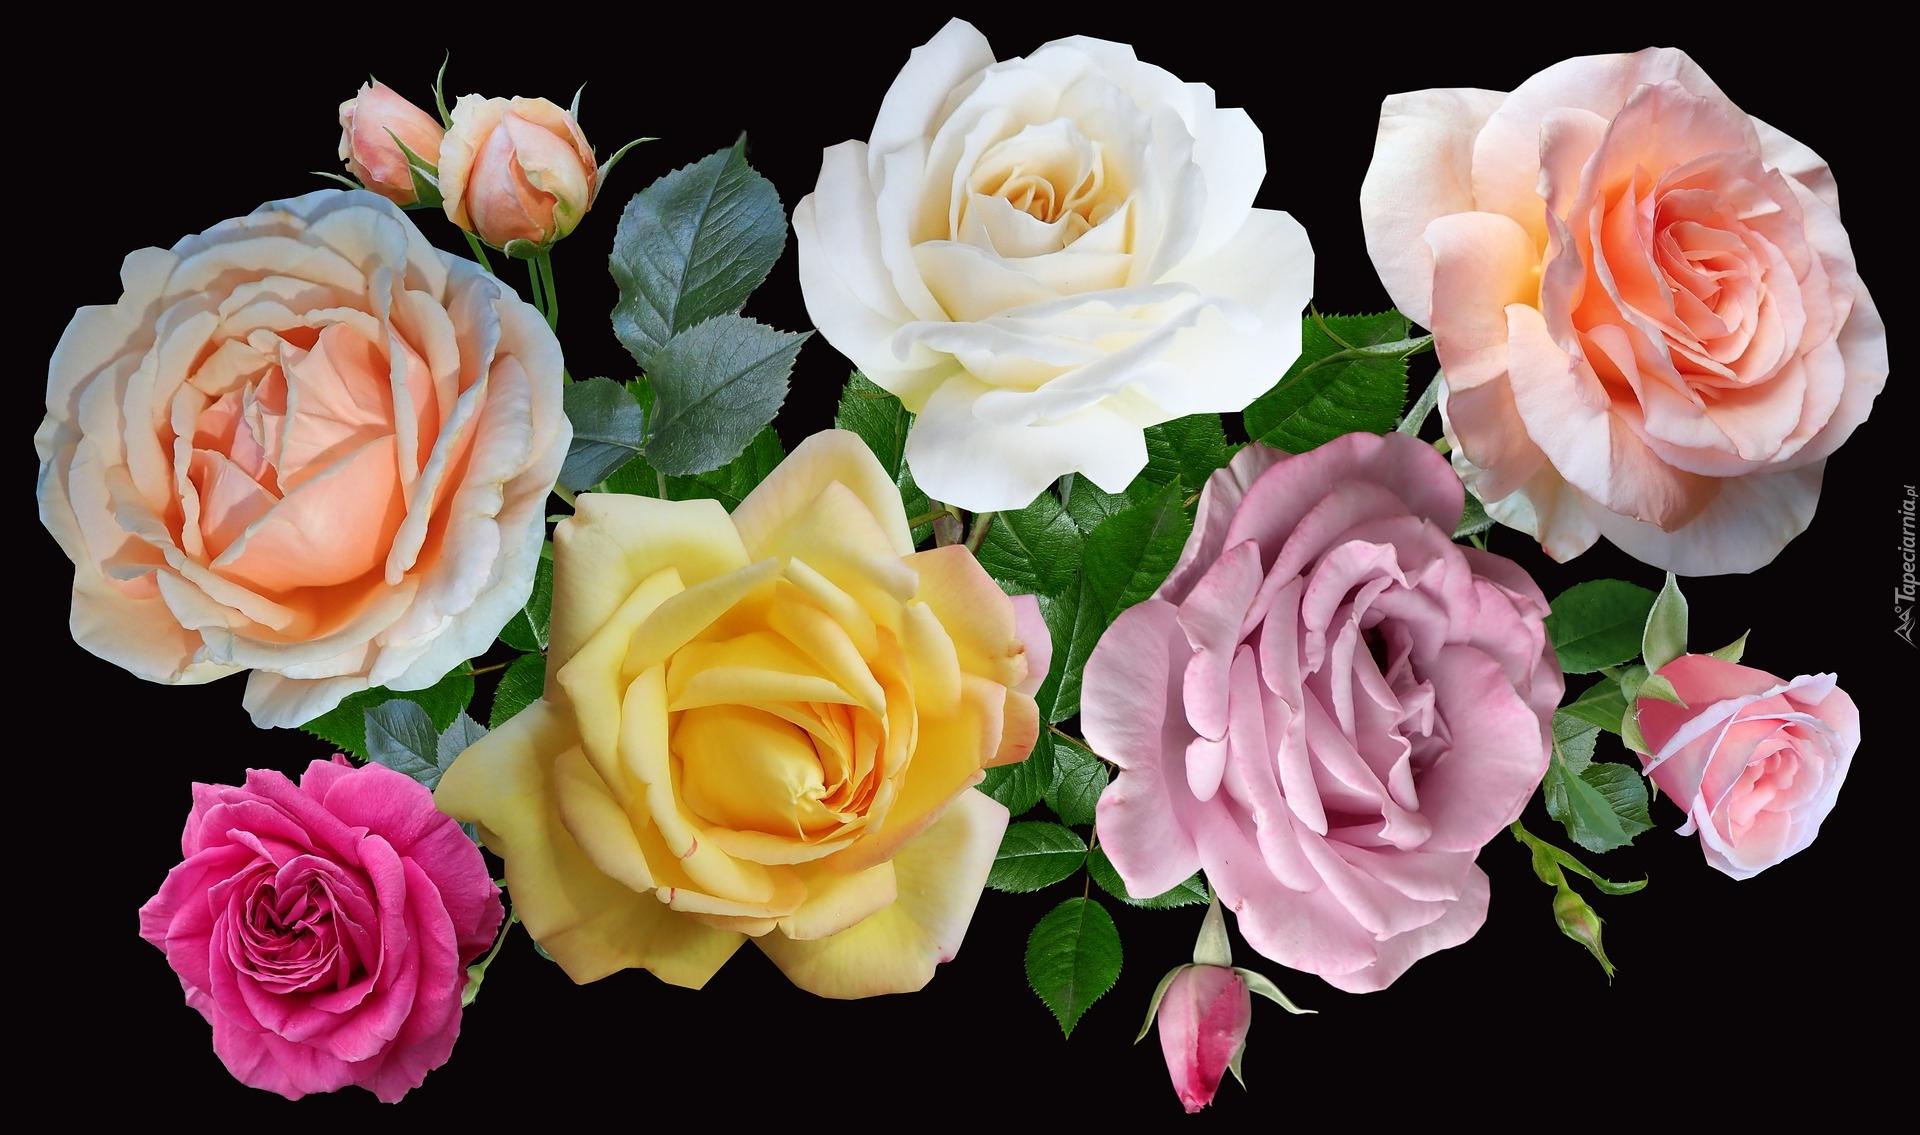 tapeta-kolorowe-roze-na-czarnym-tle.jpg